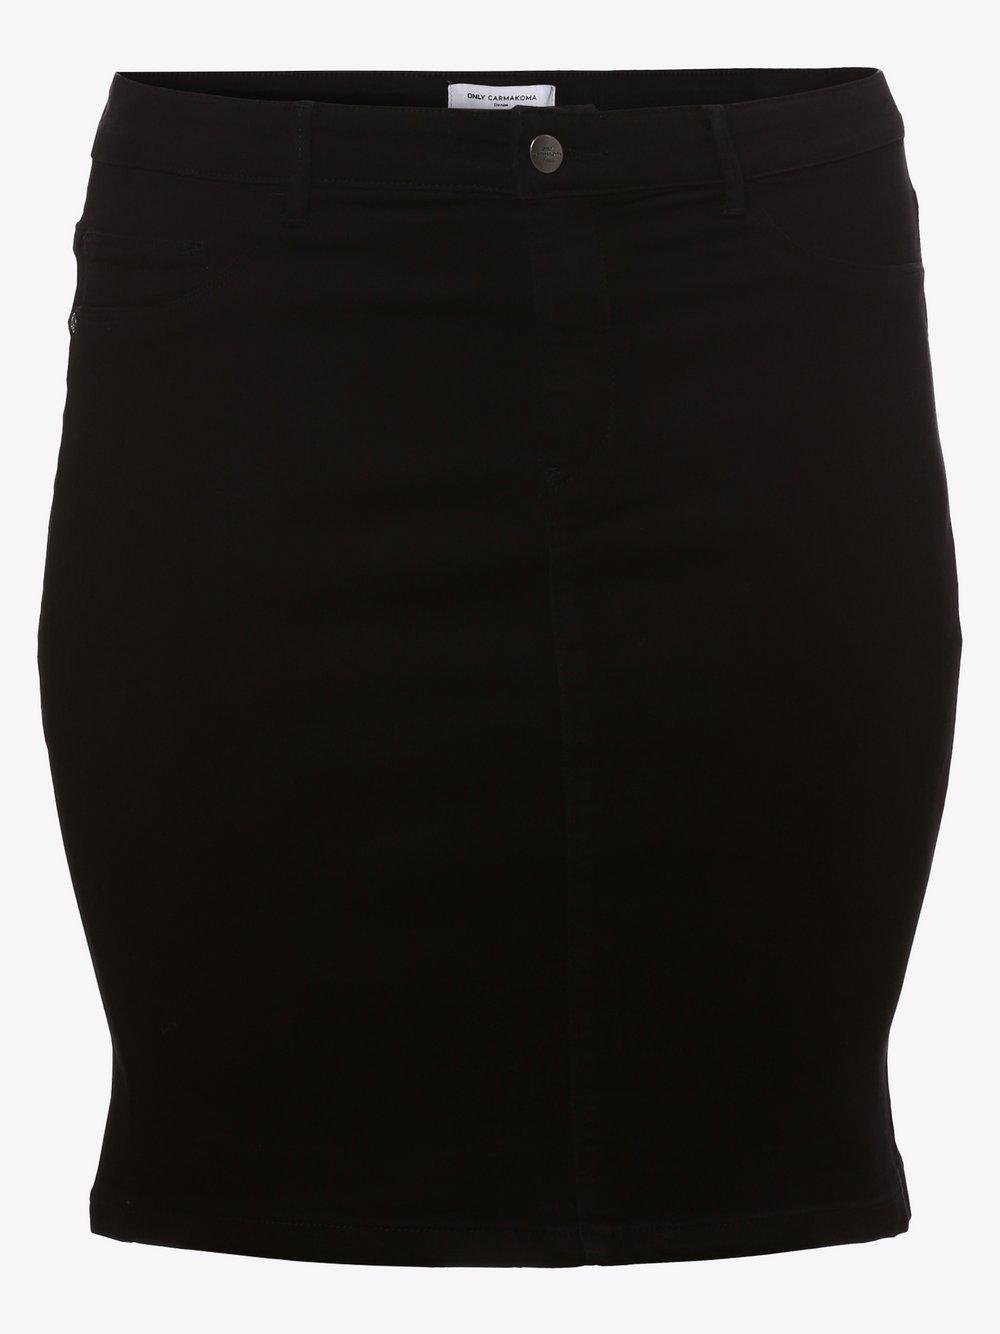 ONLY Carmakoma – Spódnica damska – Carthunder, czarny Van Graaf 476889-0001-00540